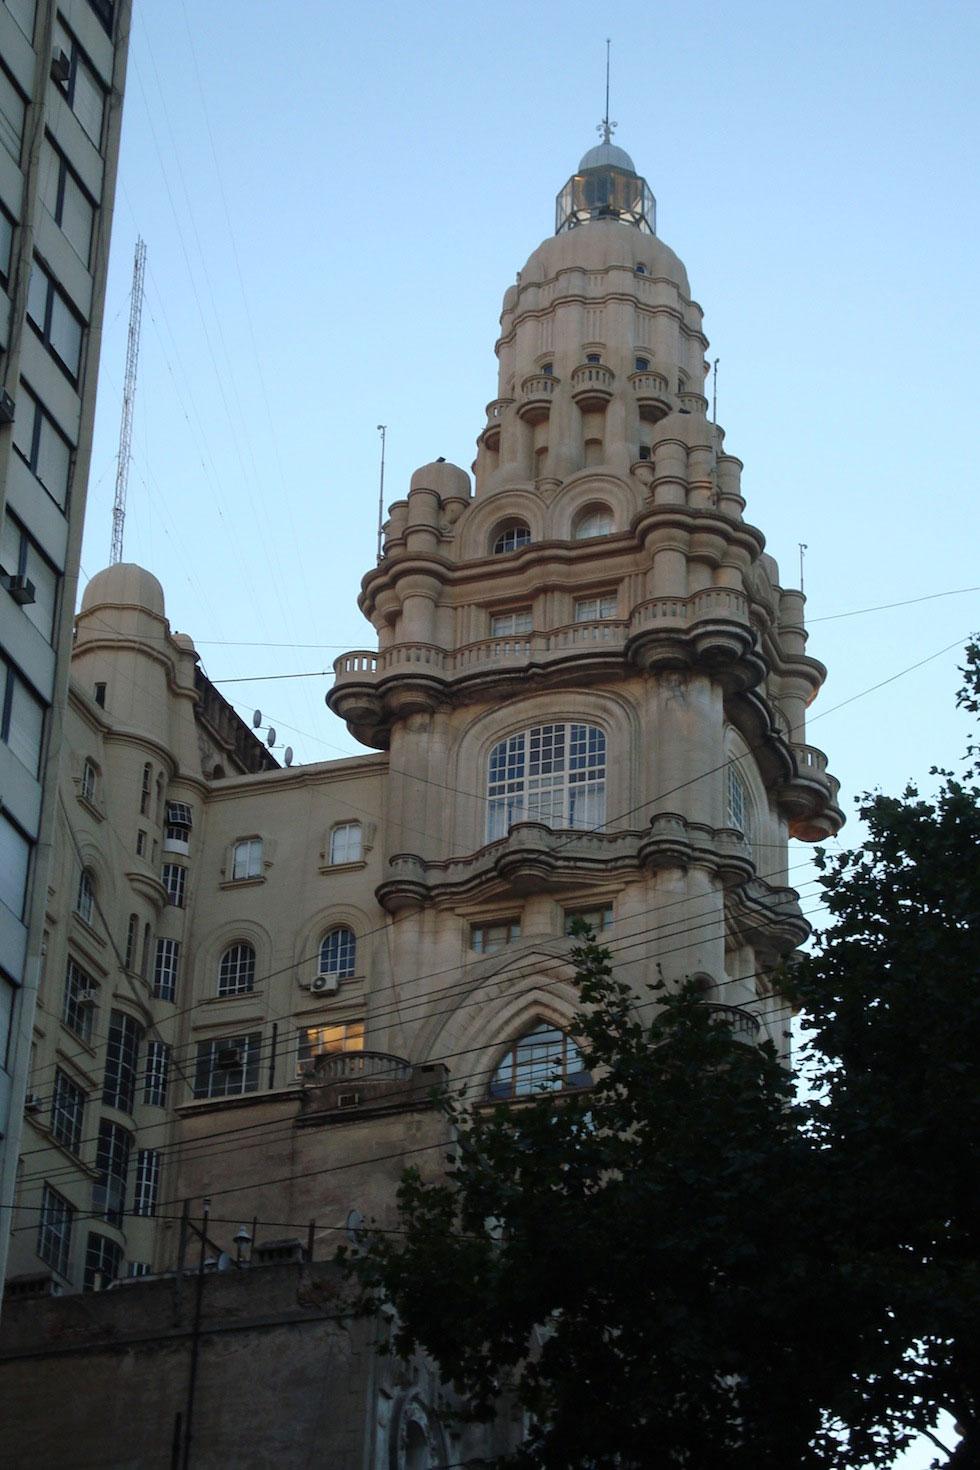 Palacio Barolo, aka the Dante building